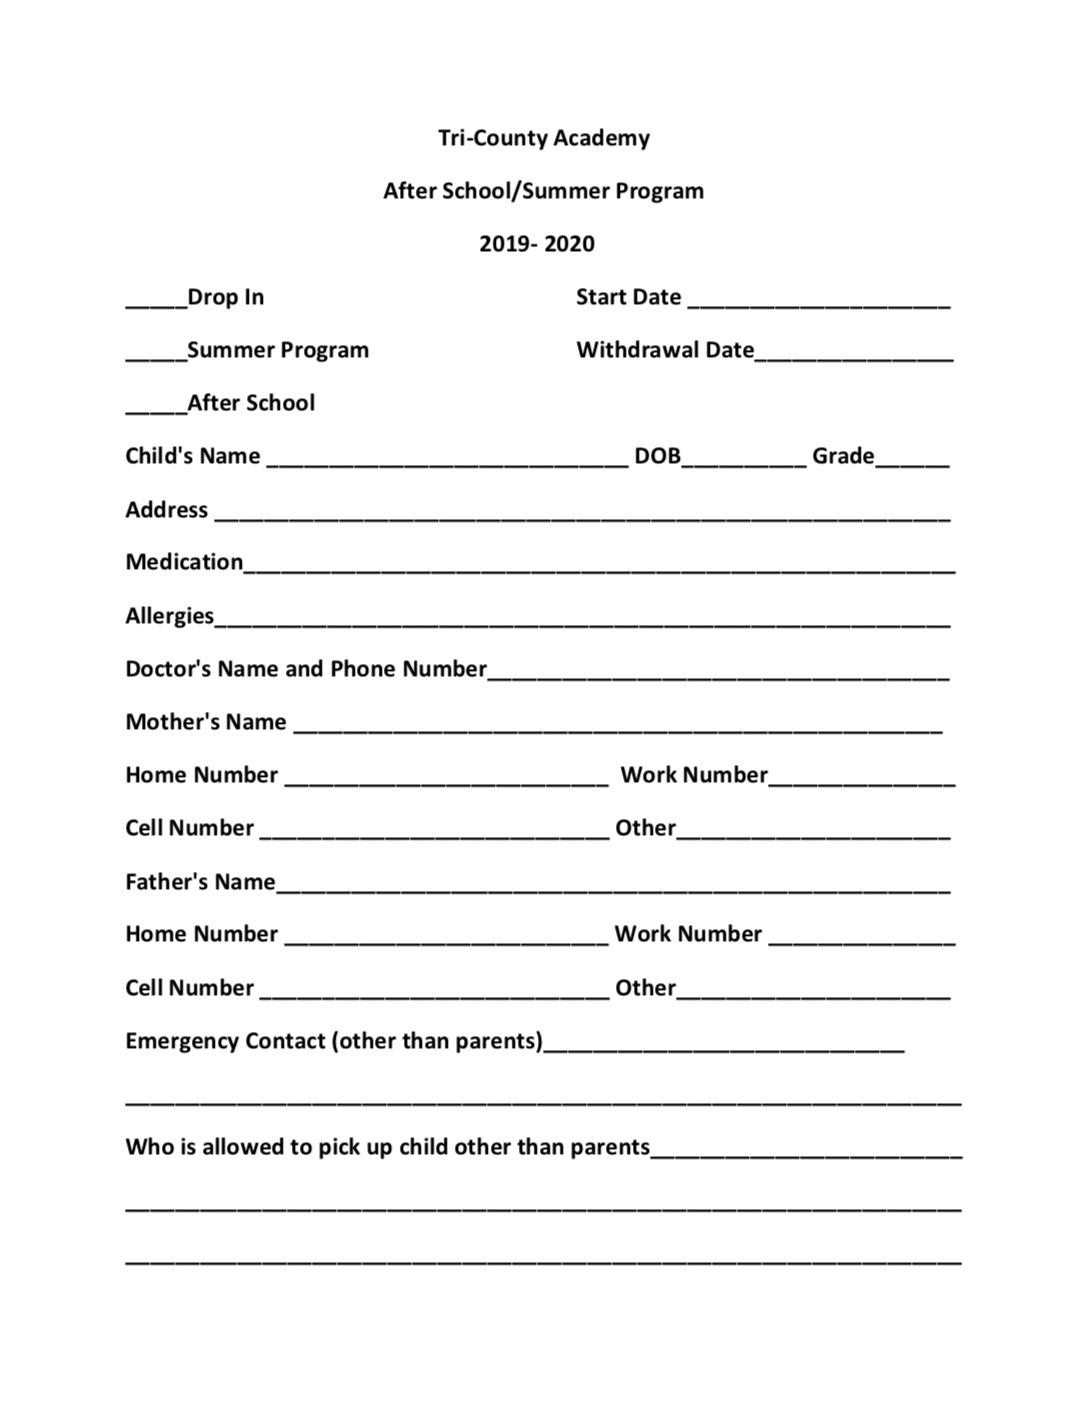 After School/Summer Program